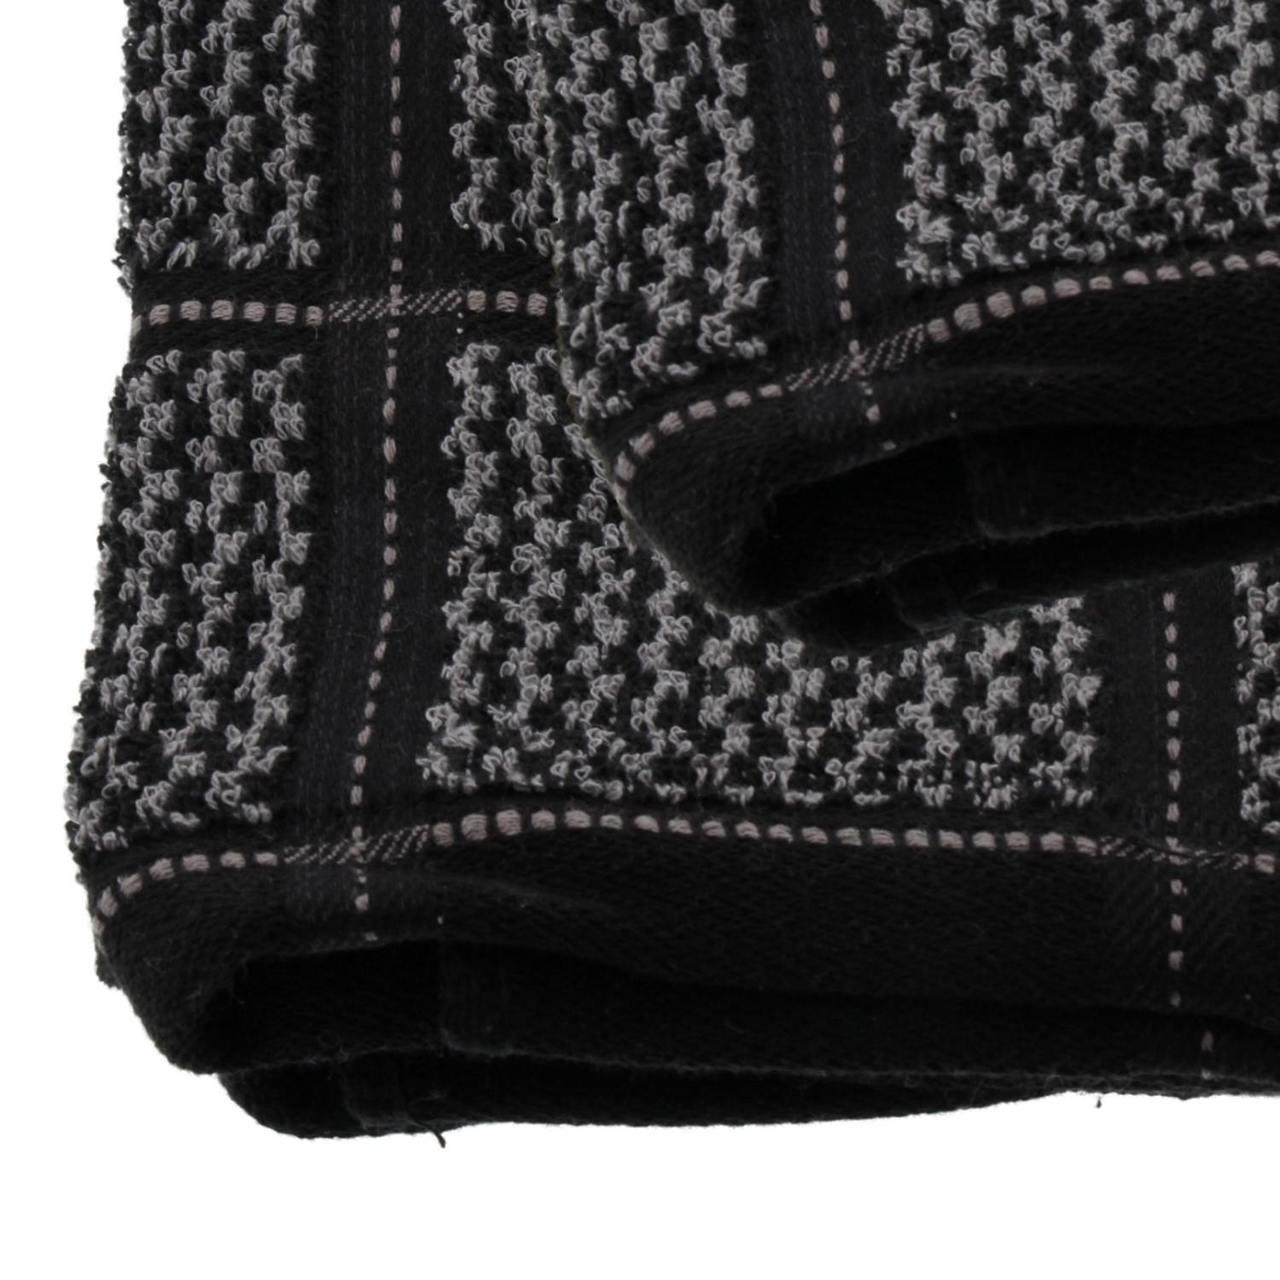 https://d3d71ba2asa5oz.cloudfront.net/23000296/images/cuisinart-kitchen-towels-black-2-ct.casku19482-3.jpg